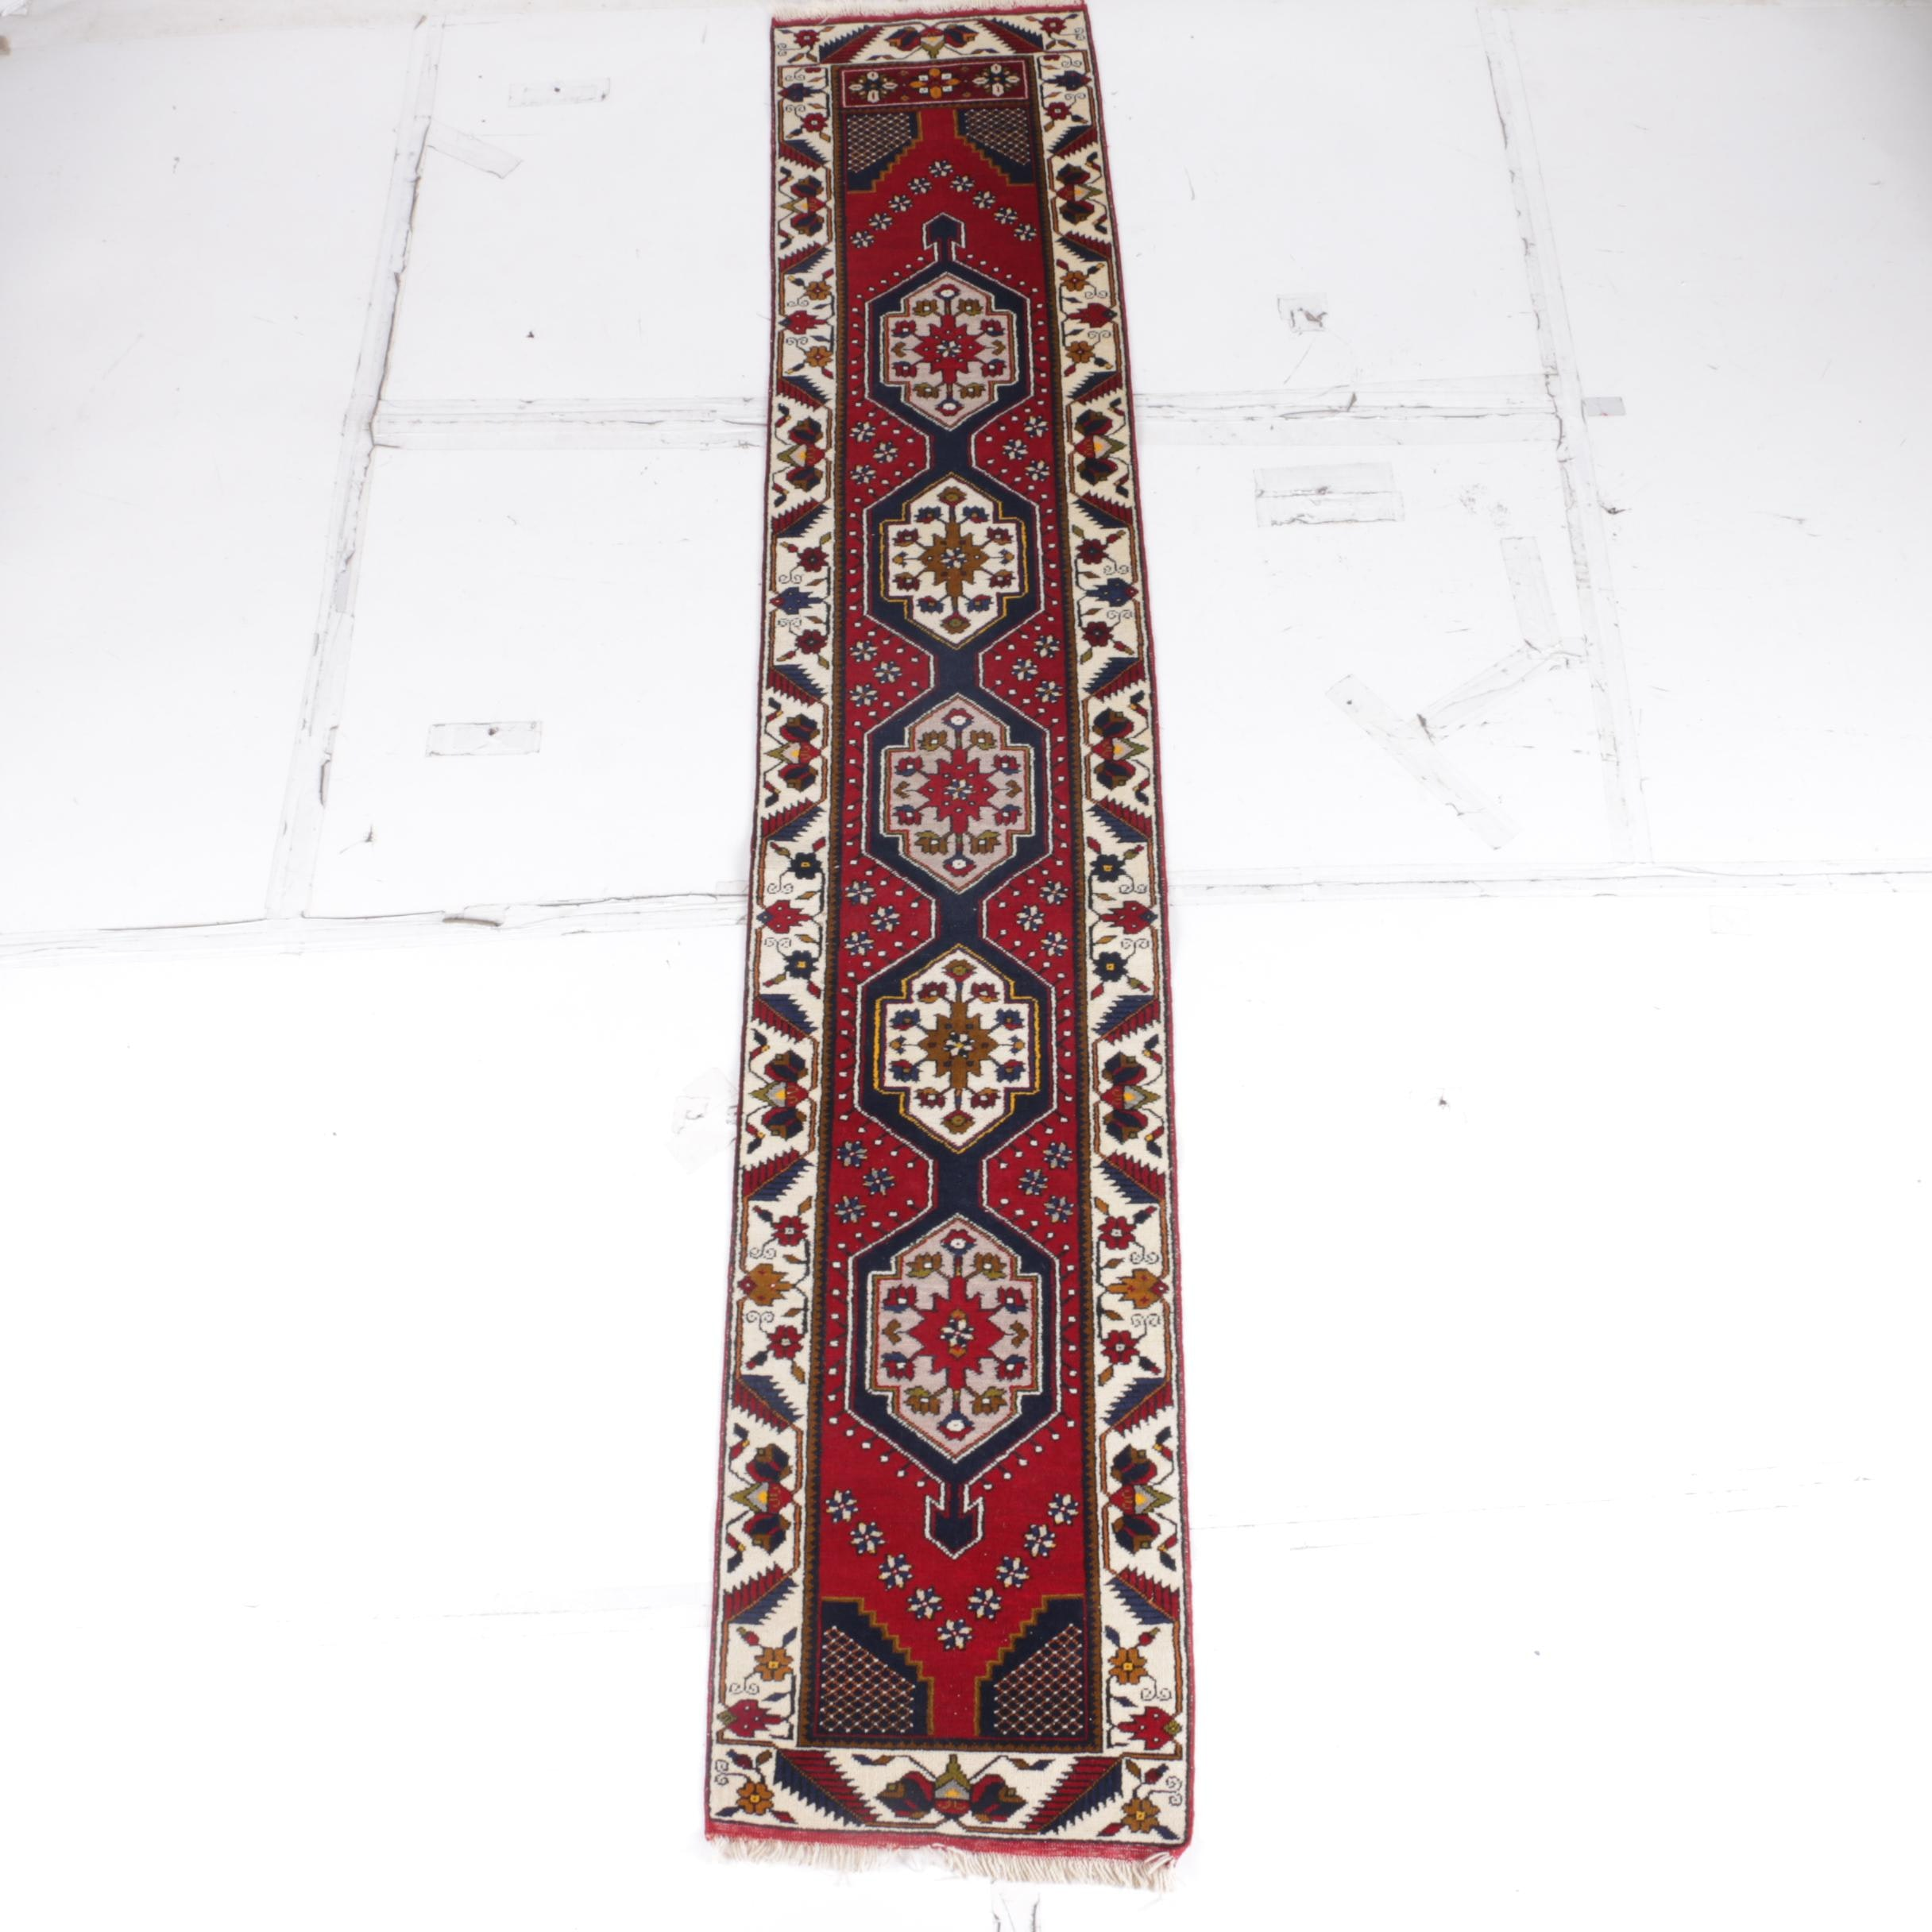 Hand-Knotted Anatolian Runner